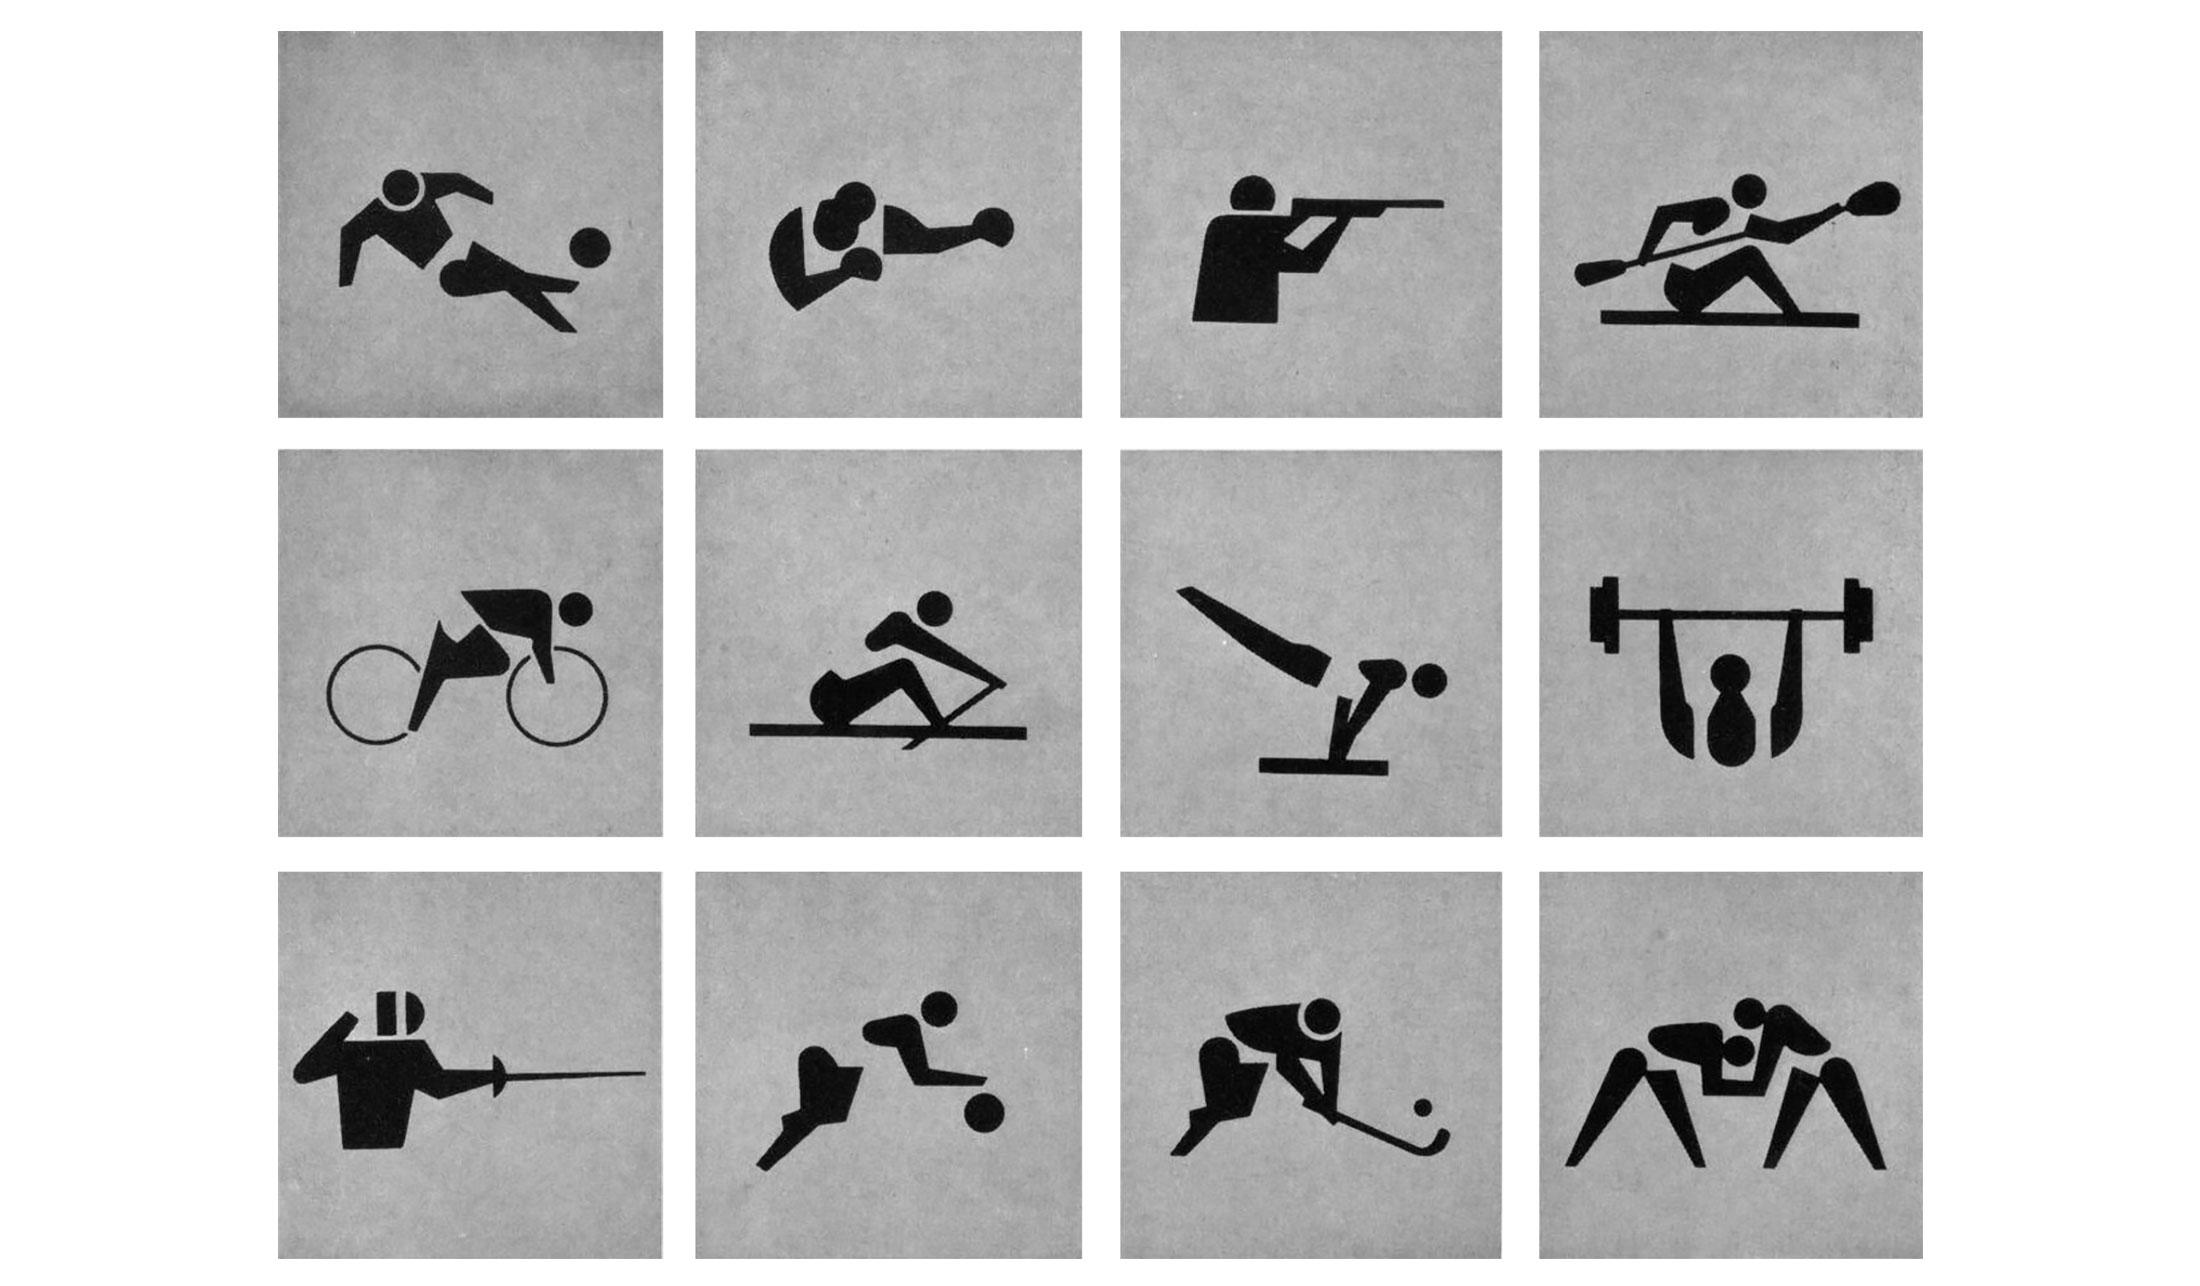 Pictogramme-Jeux-Olympiques-Tokyo-1964-YOSHIRO-YAMASHITA